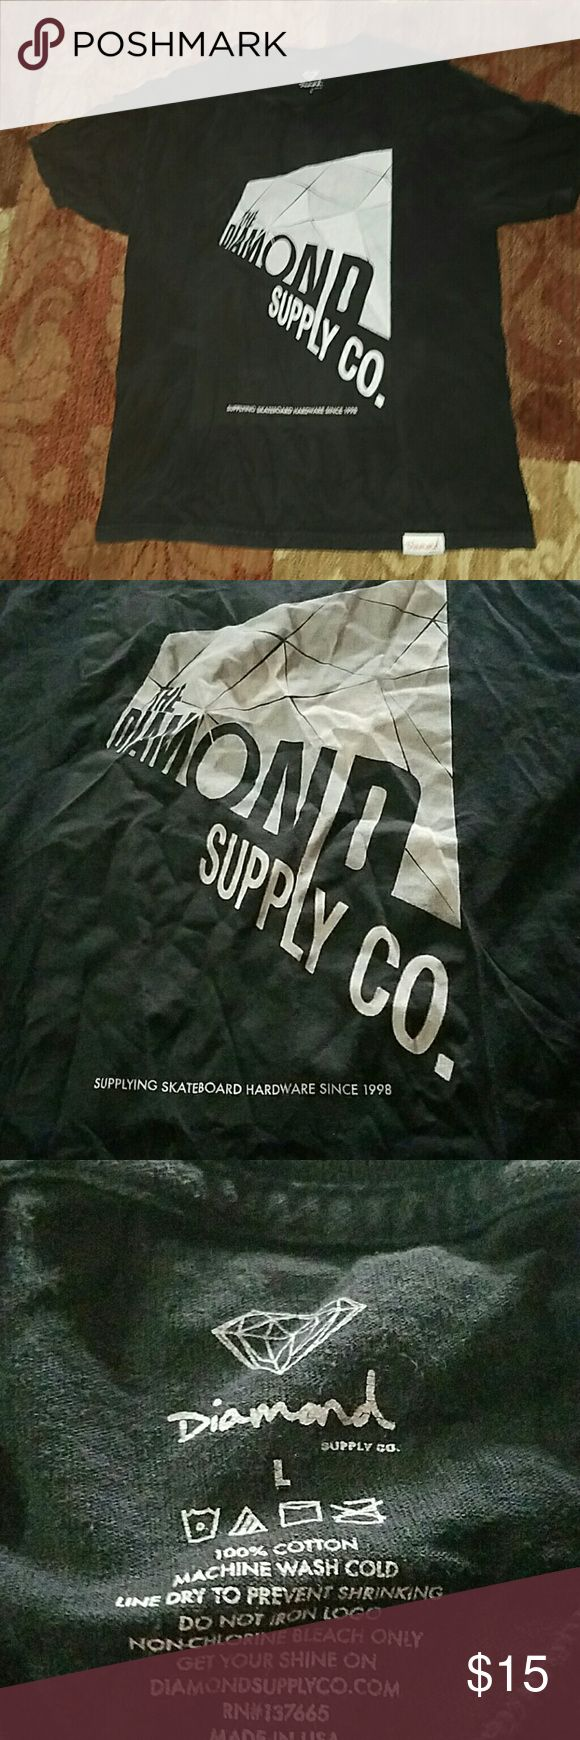 Mens diamond supply Co t-shirt Mens diamond supply Co t-shirt size large Diamond Supply Co. Shirts Tees - Short Sleeve